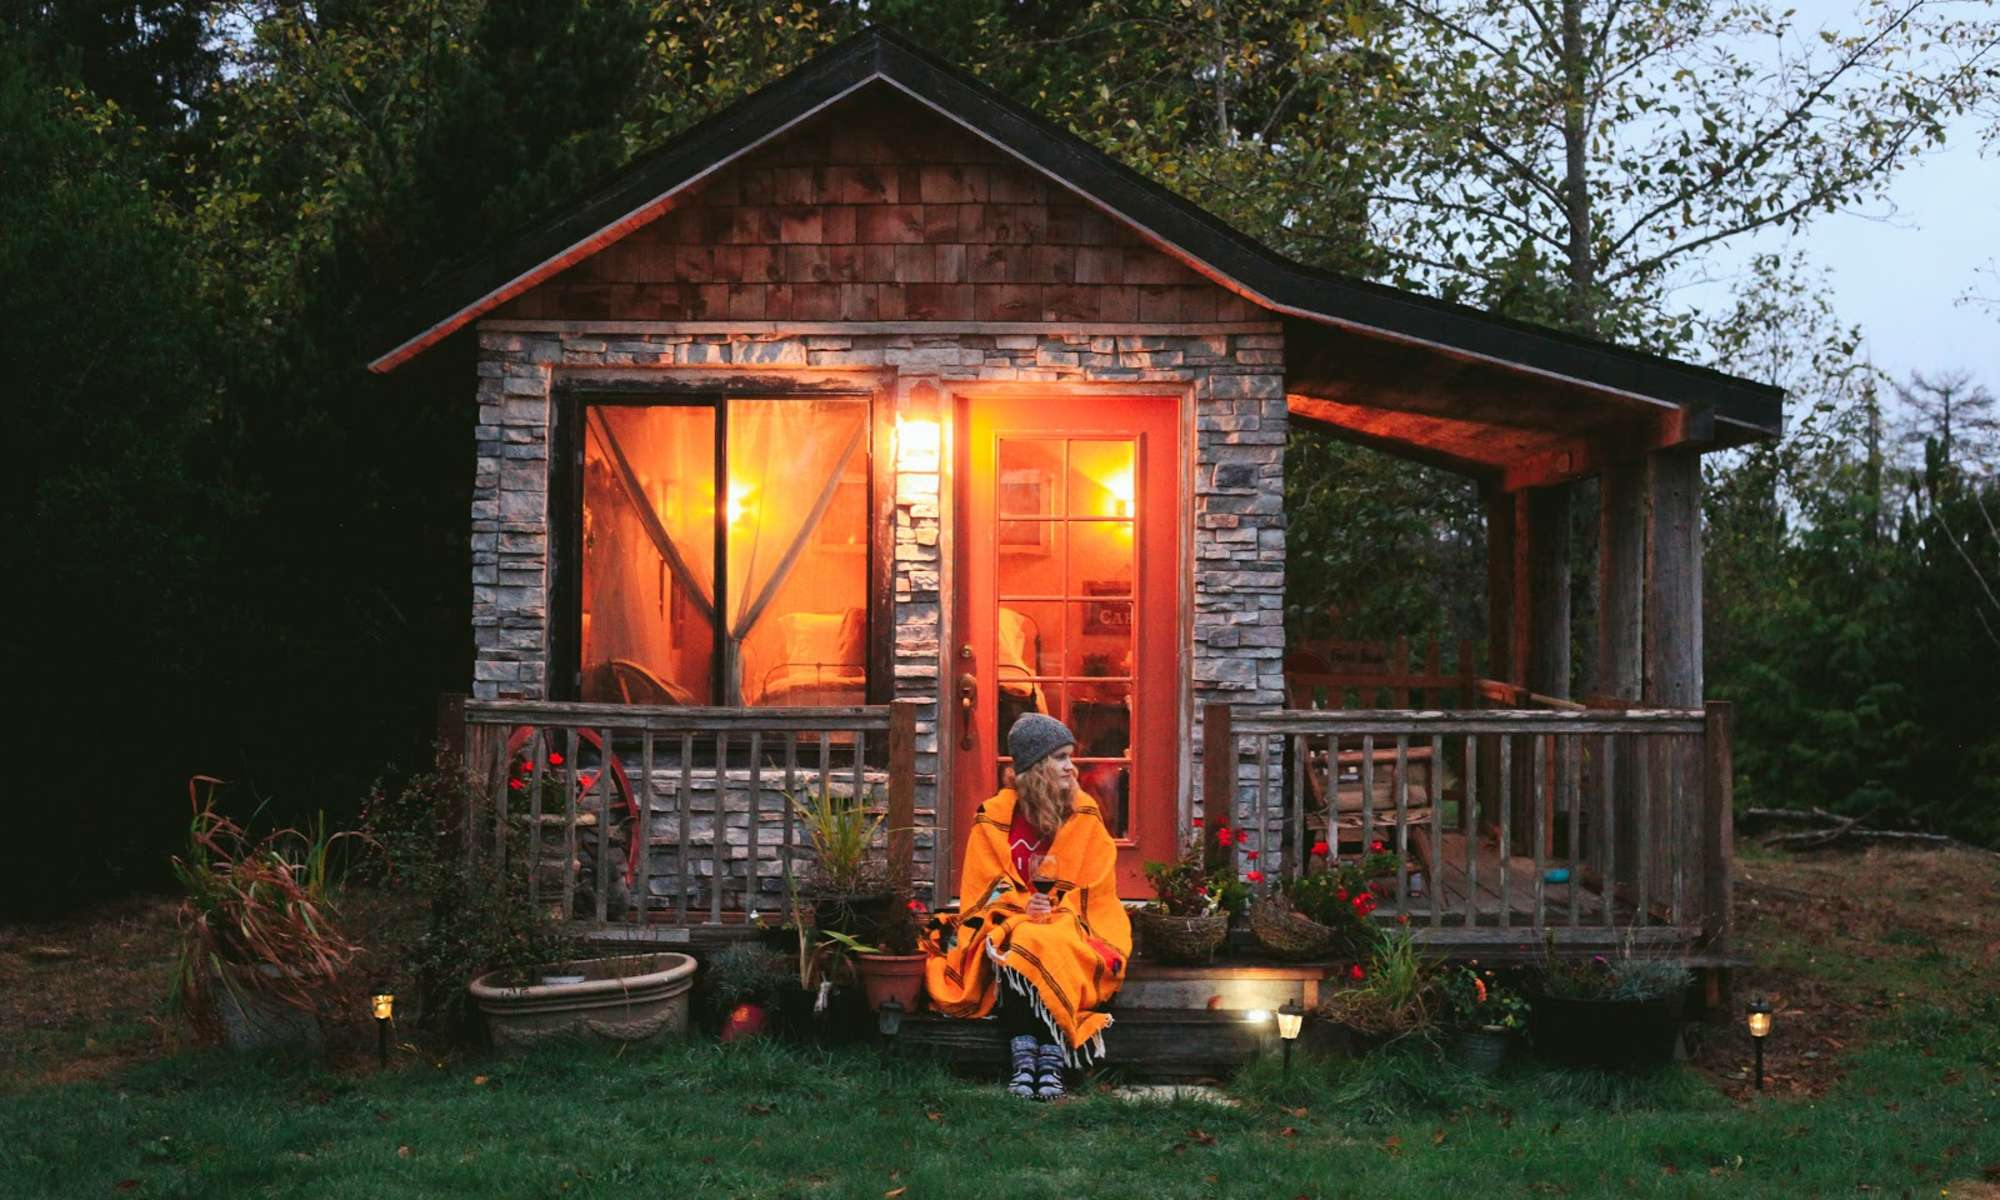 Camping Season Never Really Ends